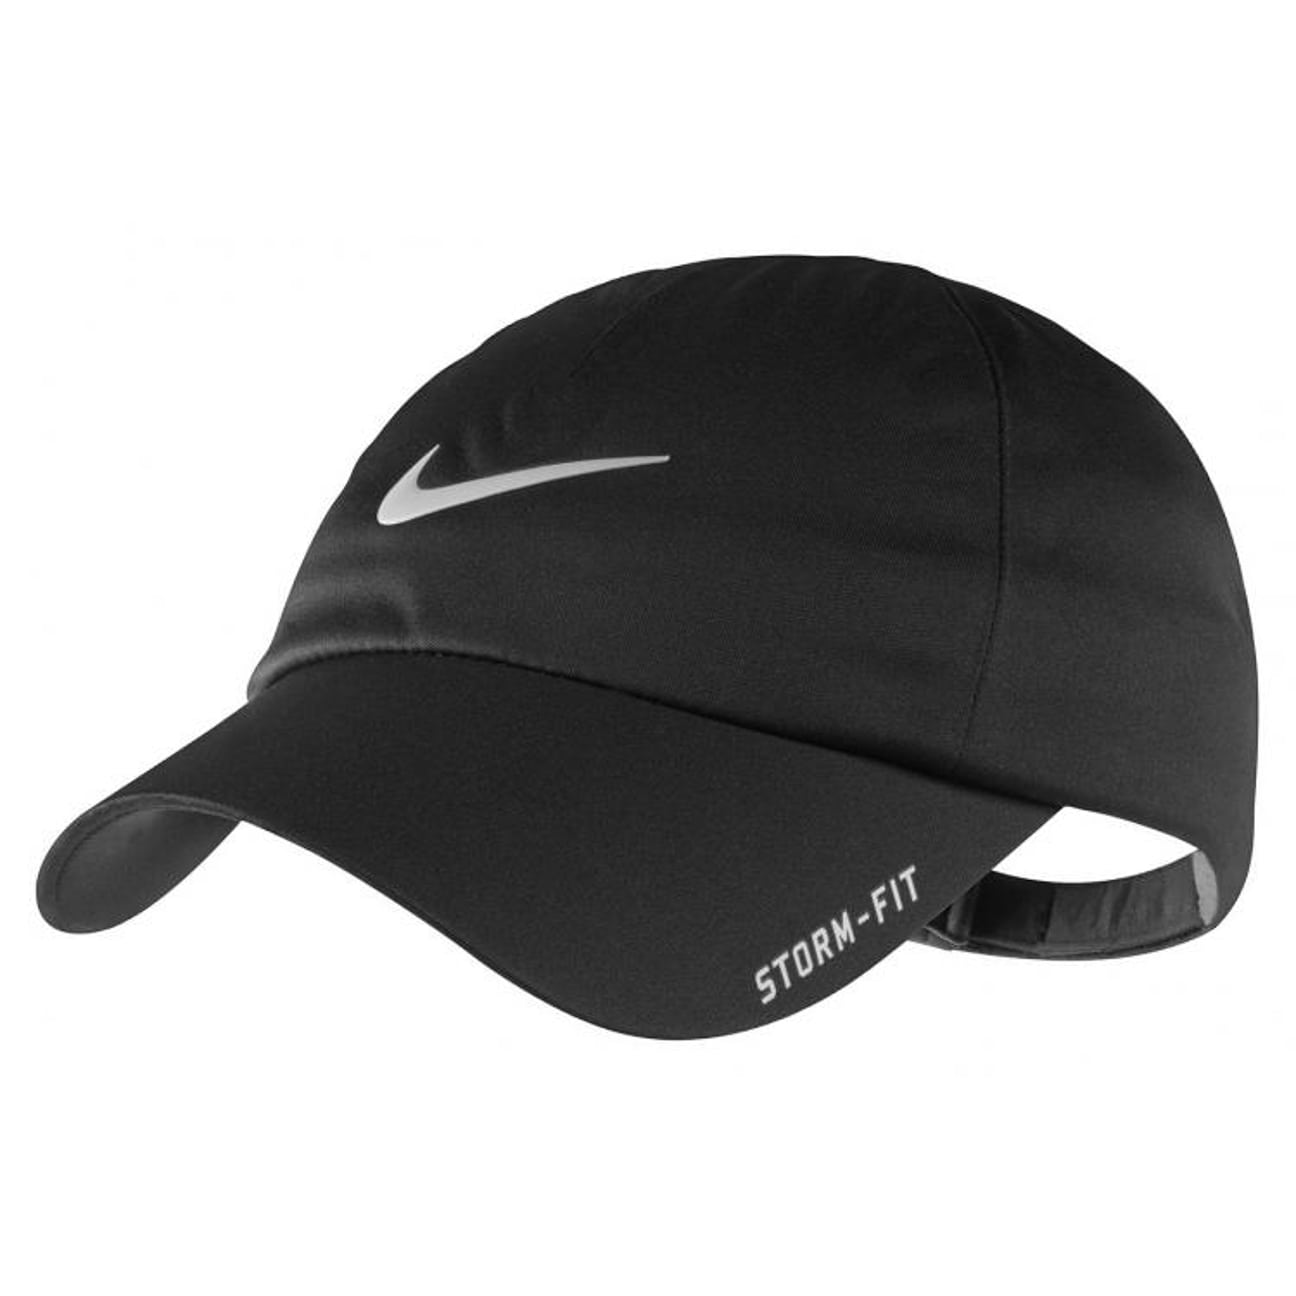 42e6d964cce56 Gorra de Béisbol Storm-Fit by Nike - Gorras - sombreroshop.es